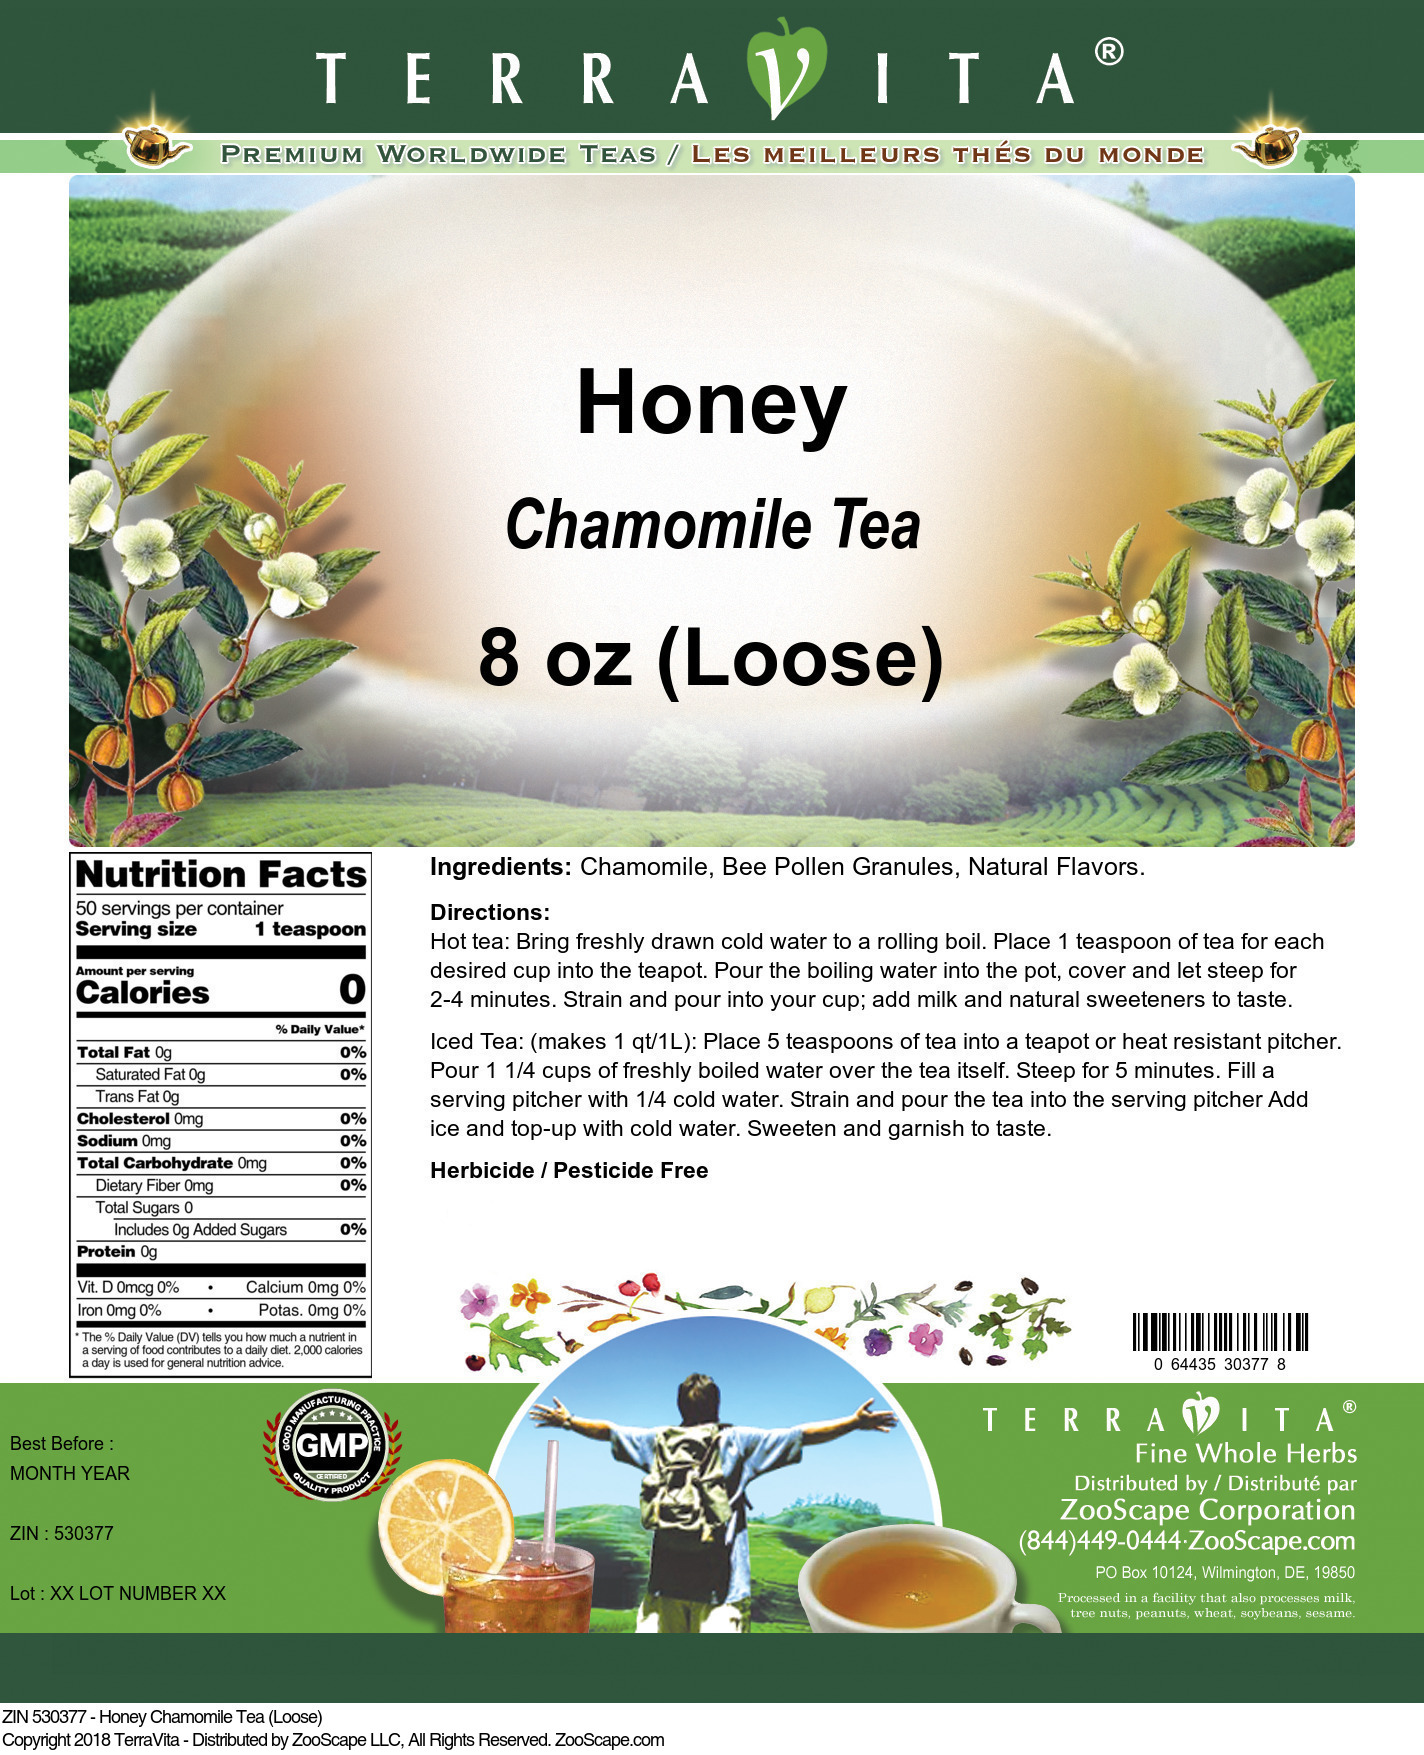 Honey Chamomile Tea (Loose)